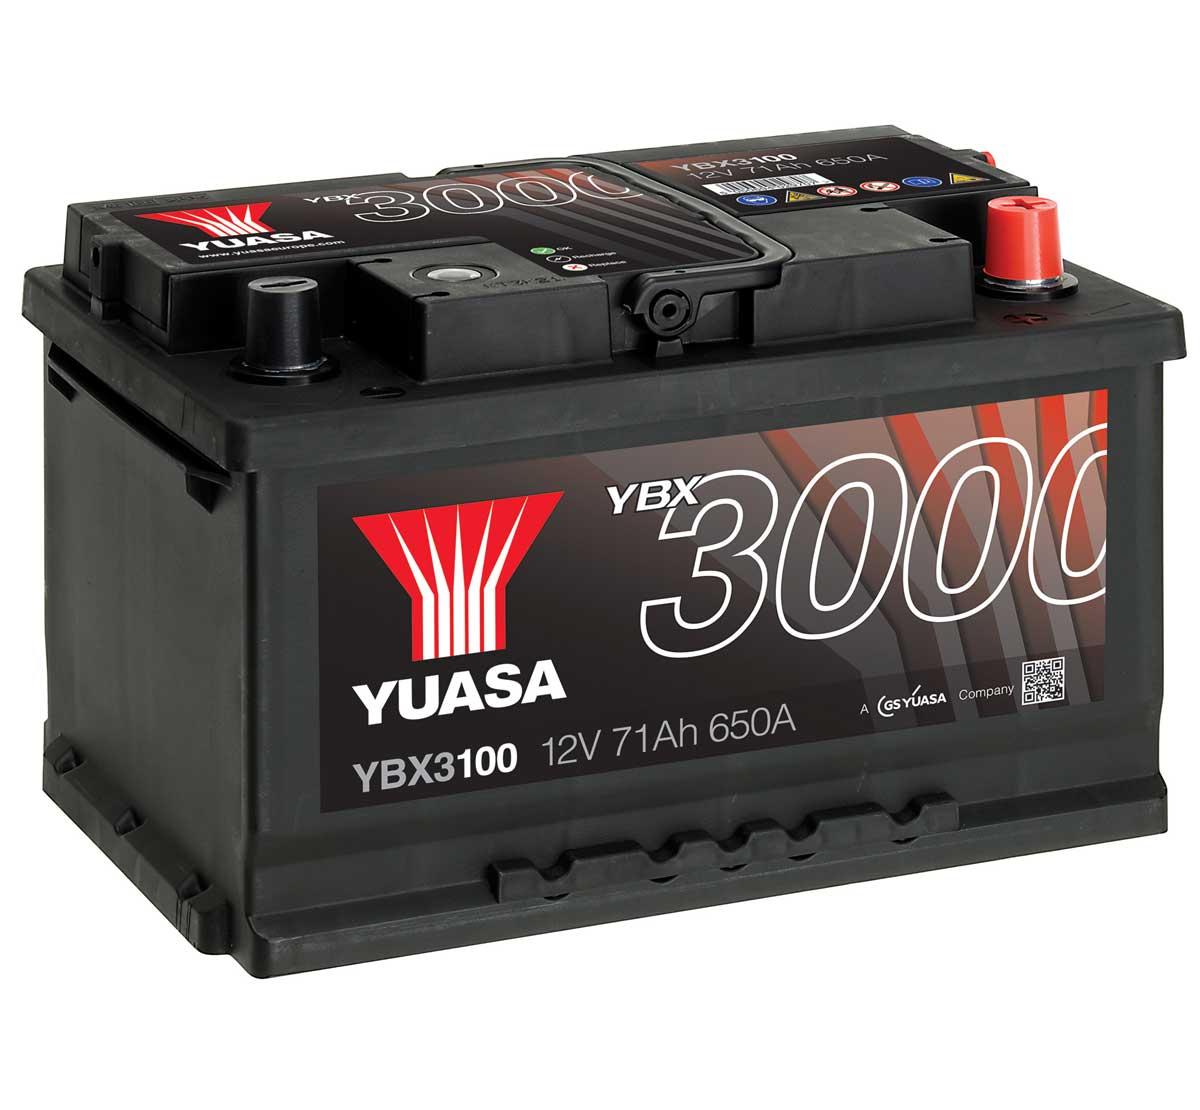 yuasa ybx3100 12v car battery mds battery. Black Bedroom Furniture Sets. Home Design Ideas